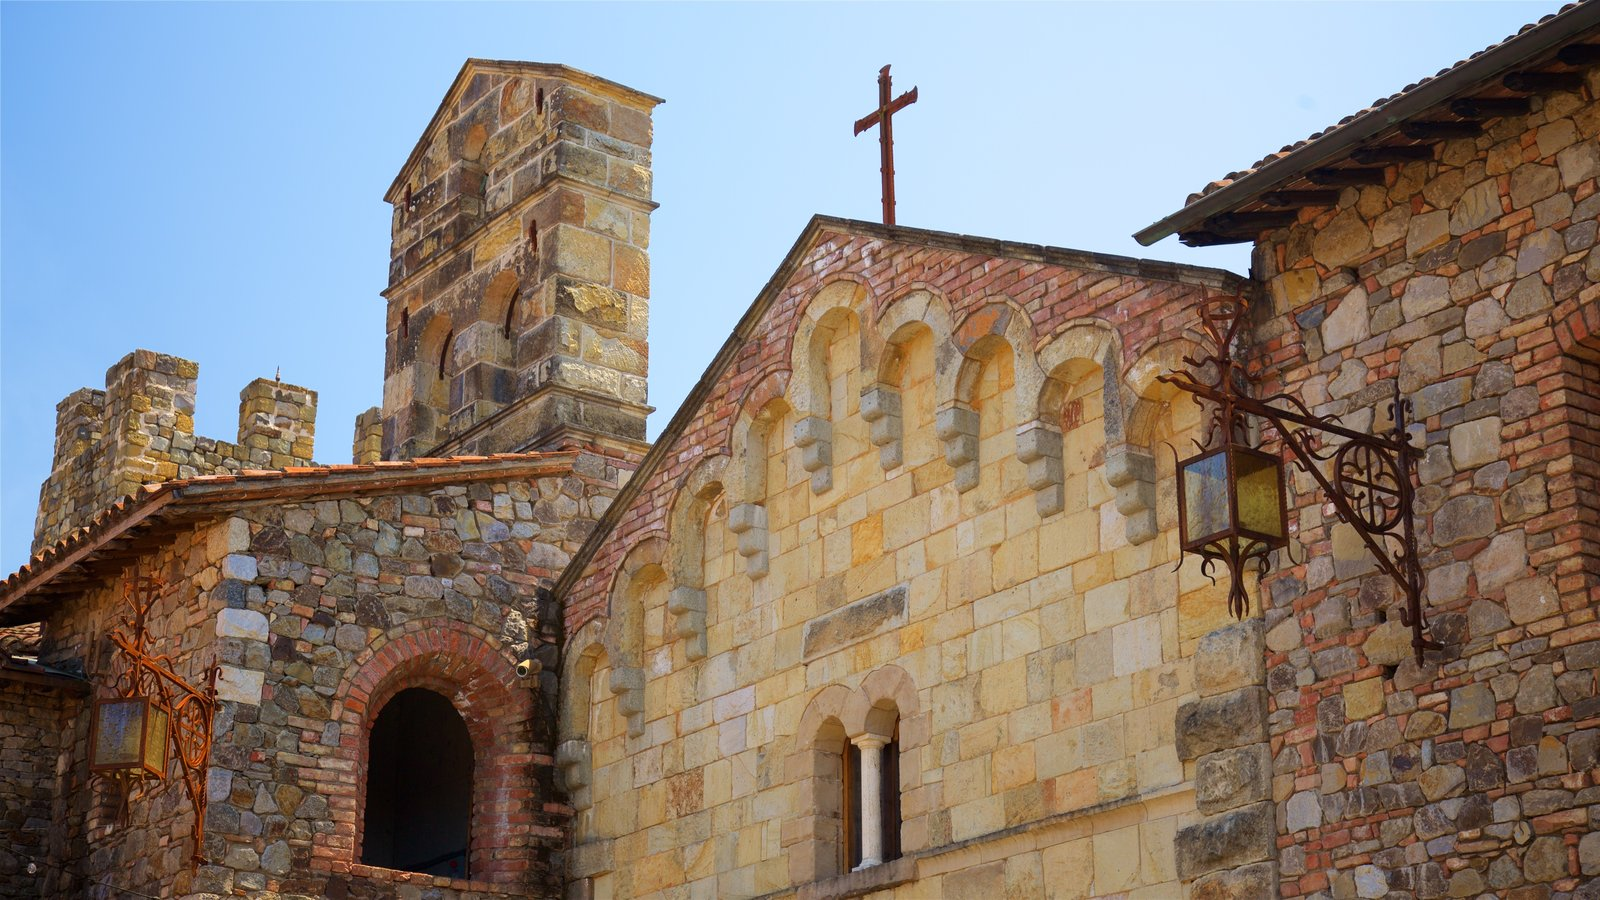 Calistoga ofreciendo elementos del patrimonio y una iglesia o catedral